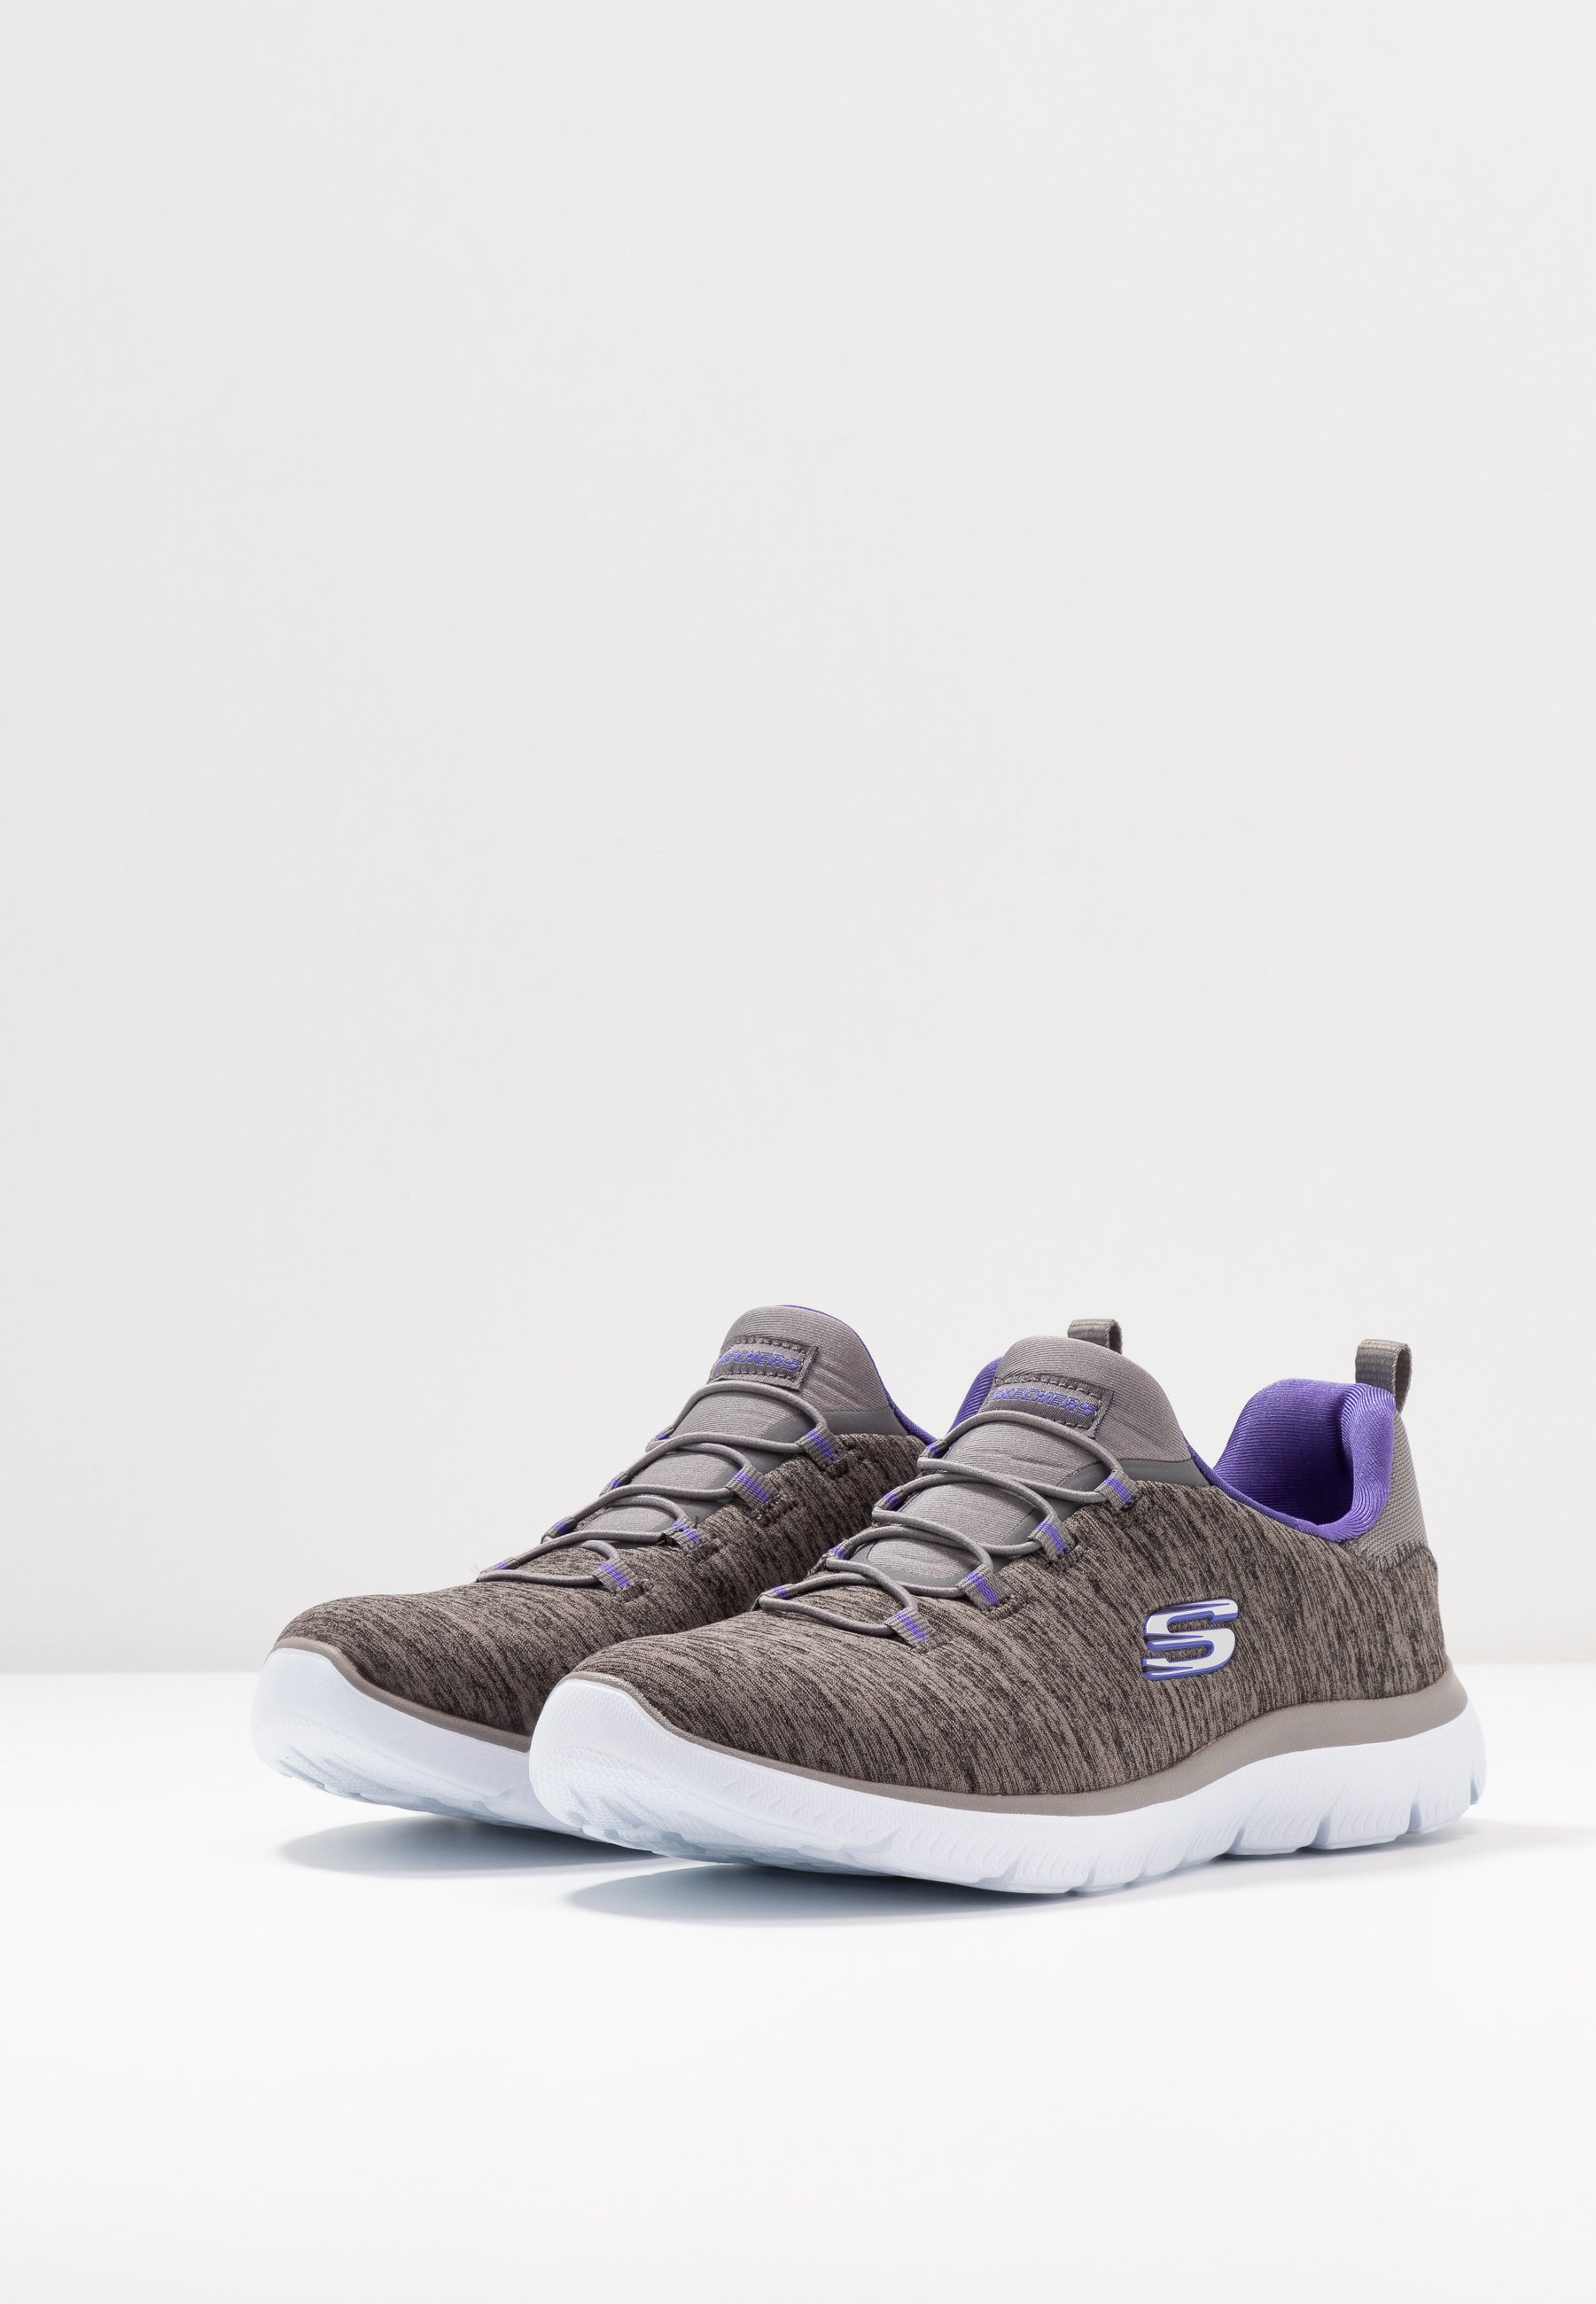 Skechers Sport SUMMITS - Slipper - charcoal/purple - Black Friday